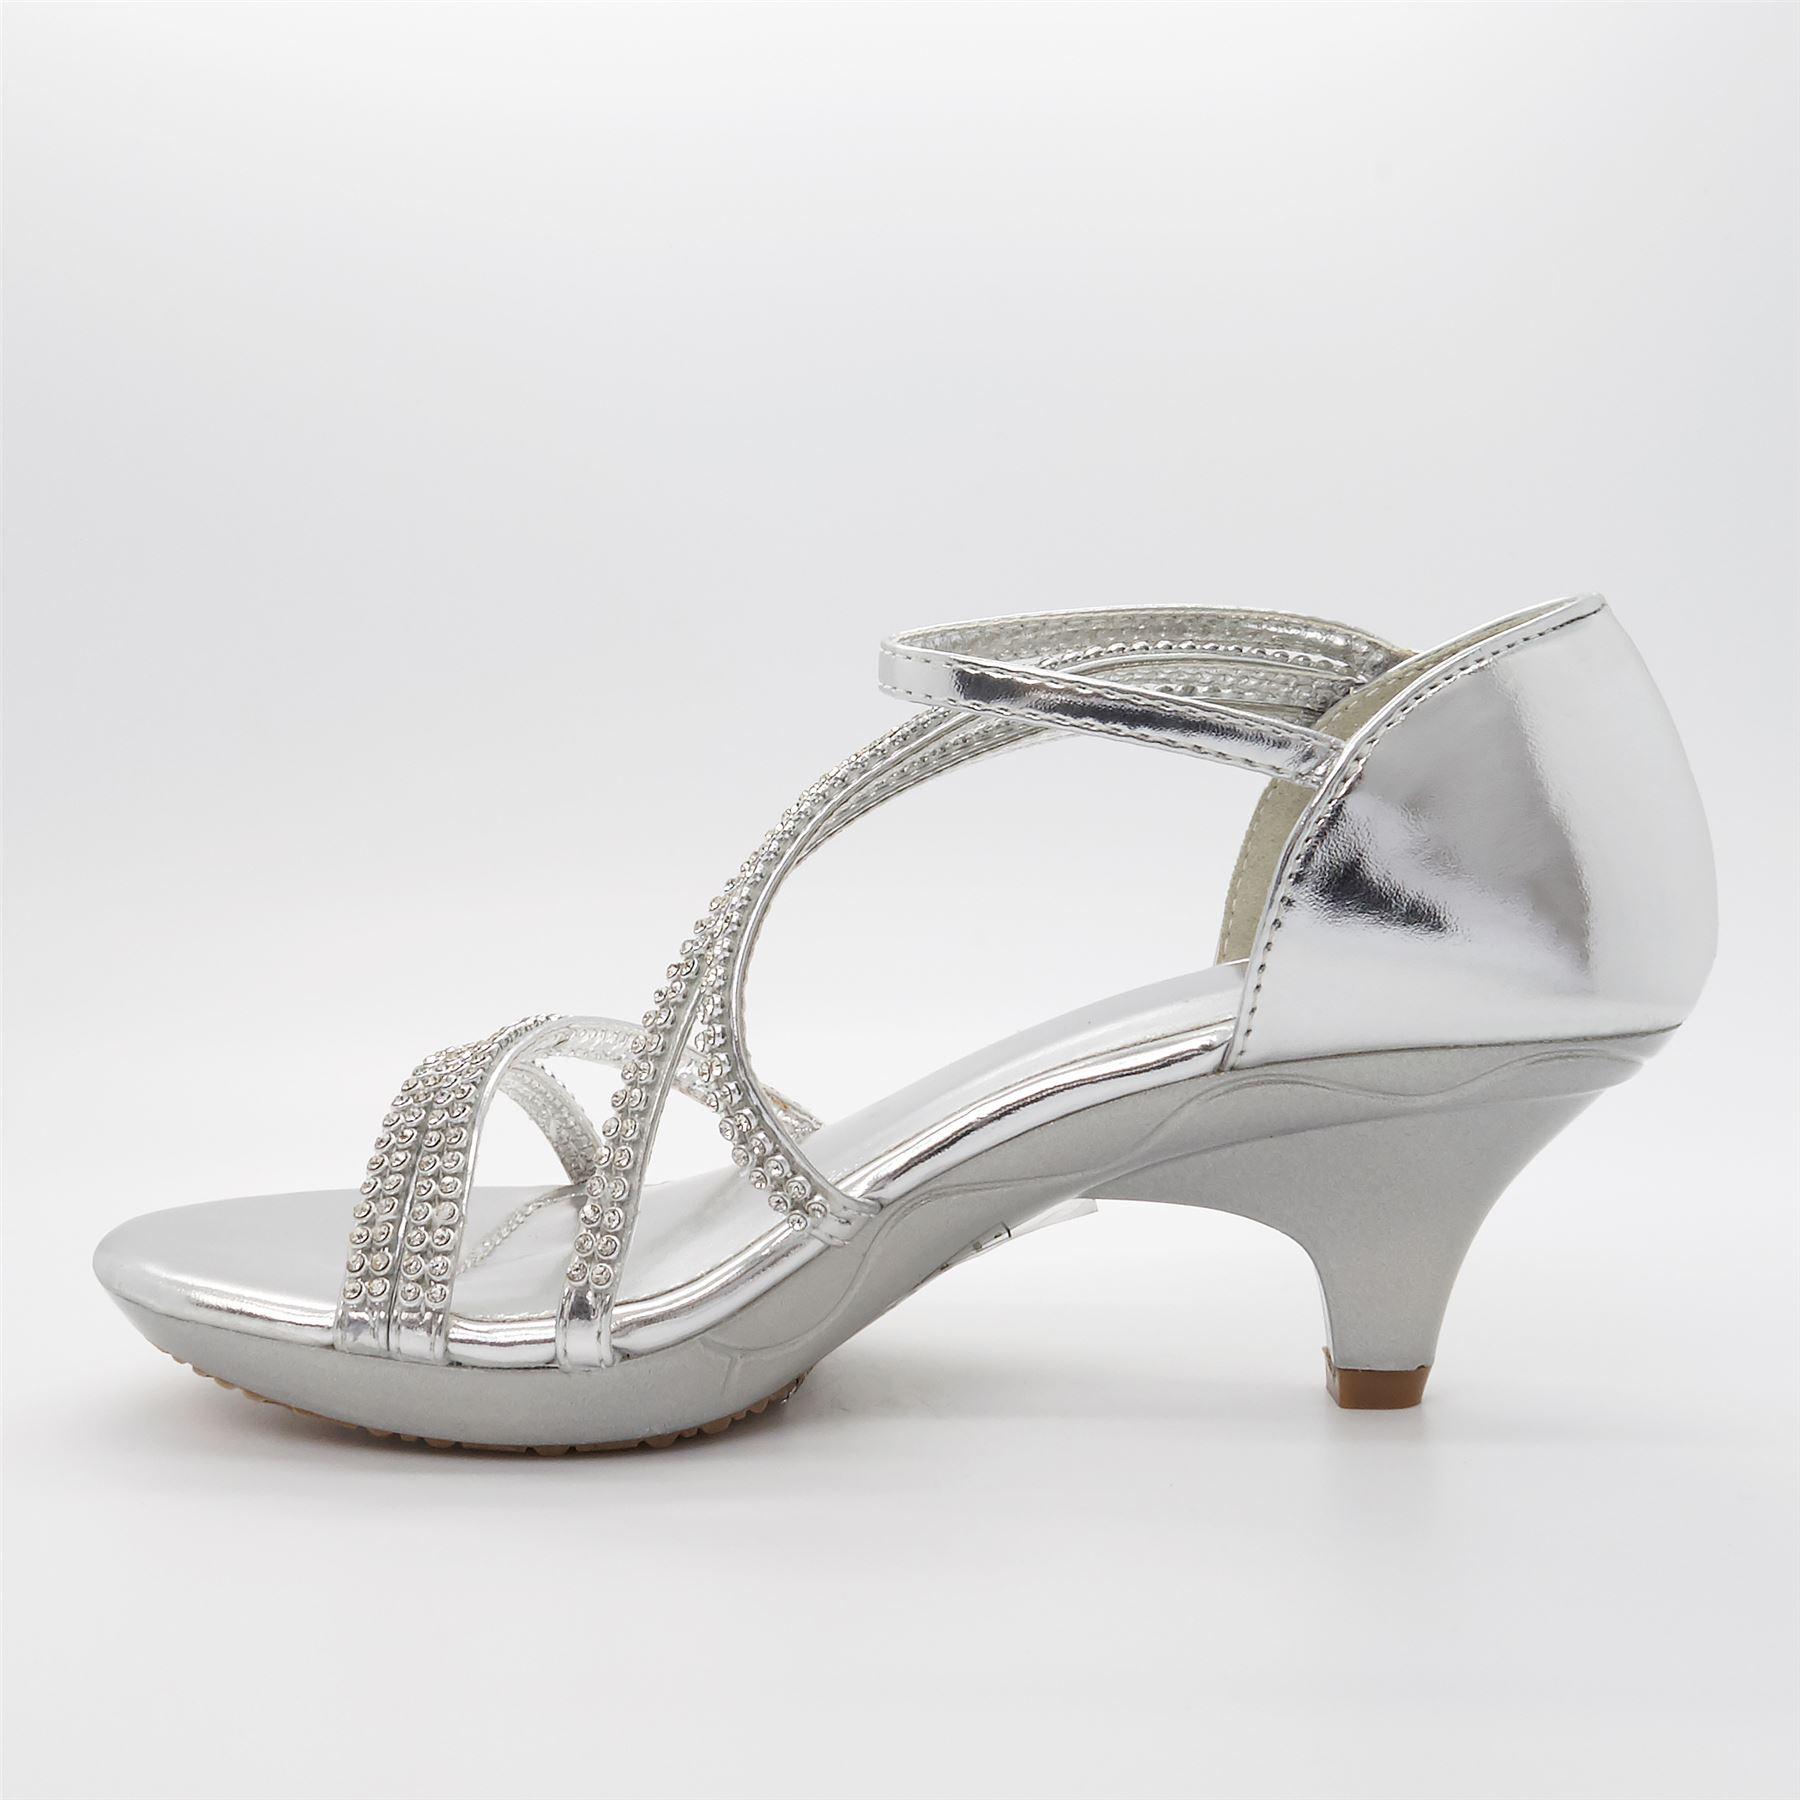 d3e175985382 Childrens Bridesmaid Low Kitten Heel Diamante Sandals Girls Kids ...